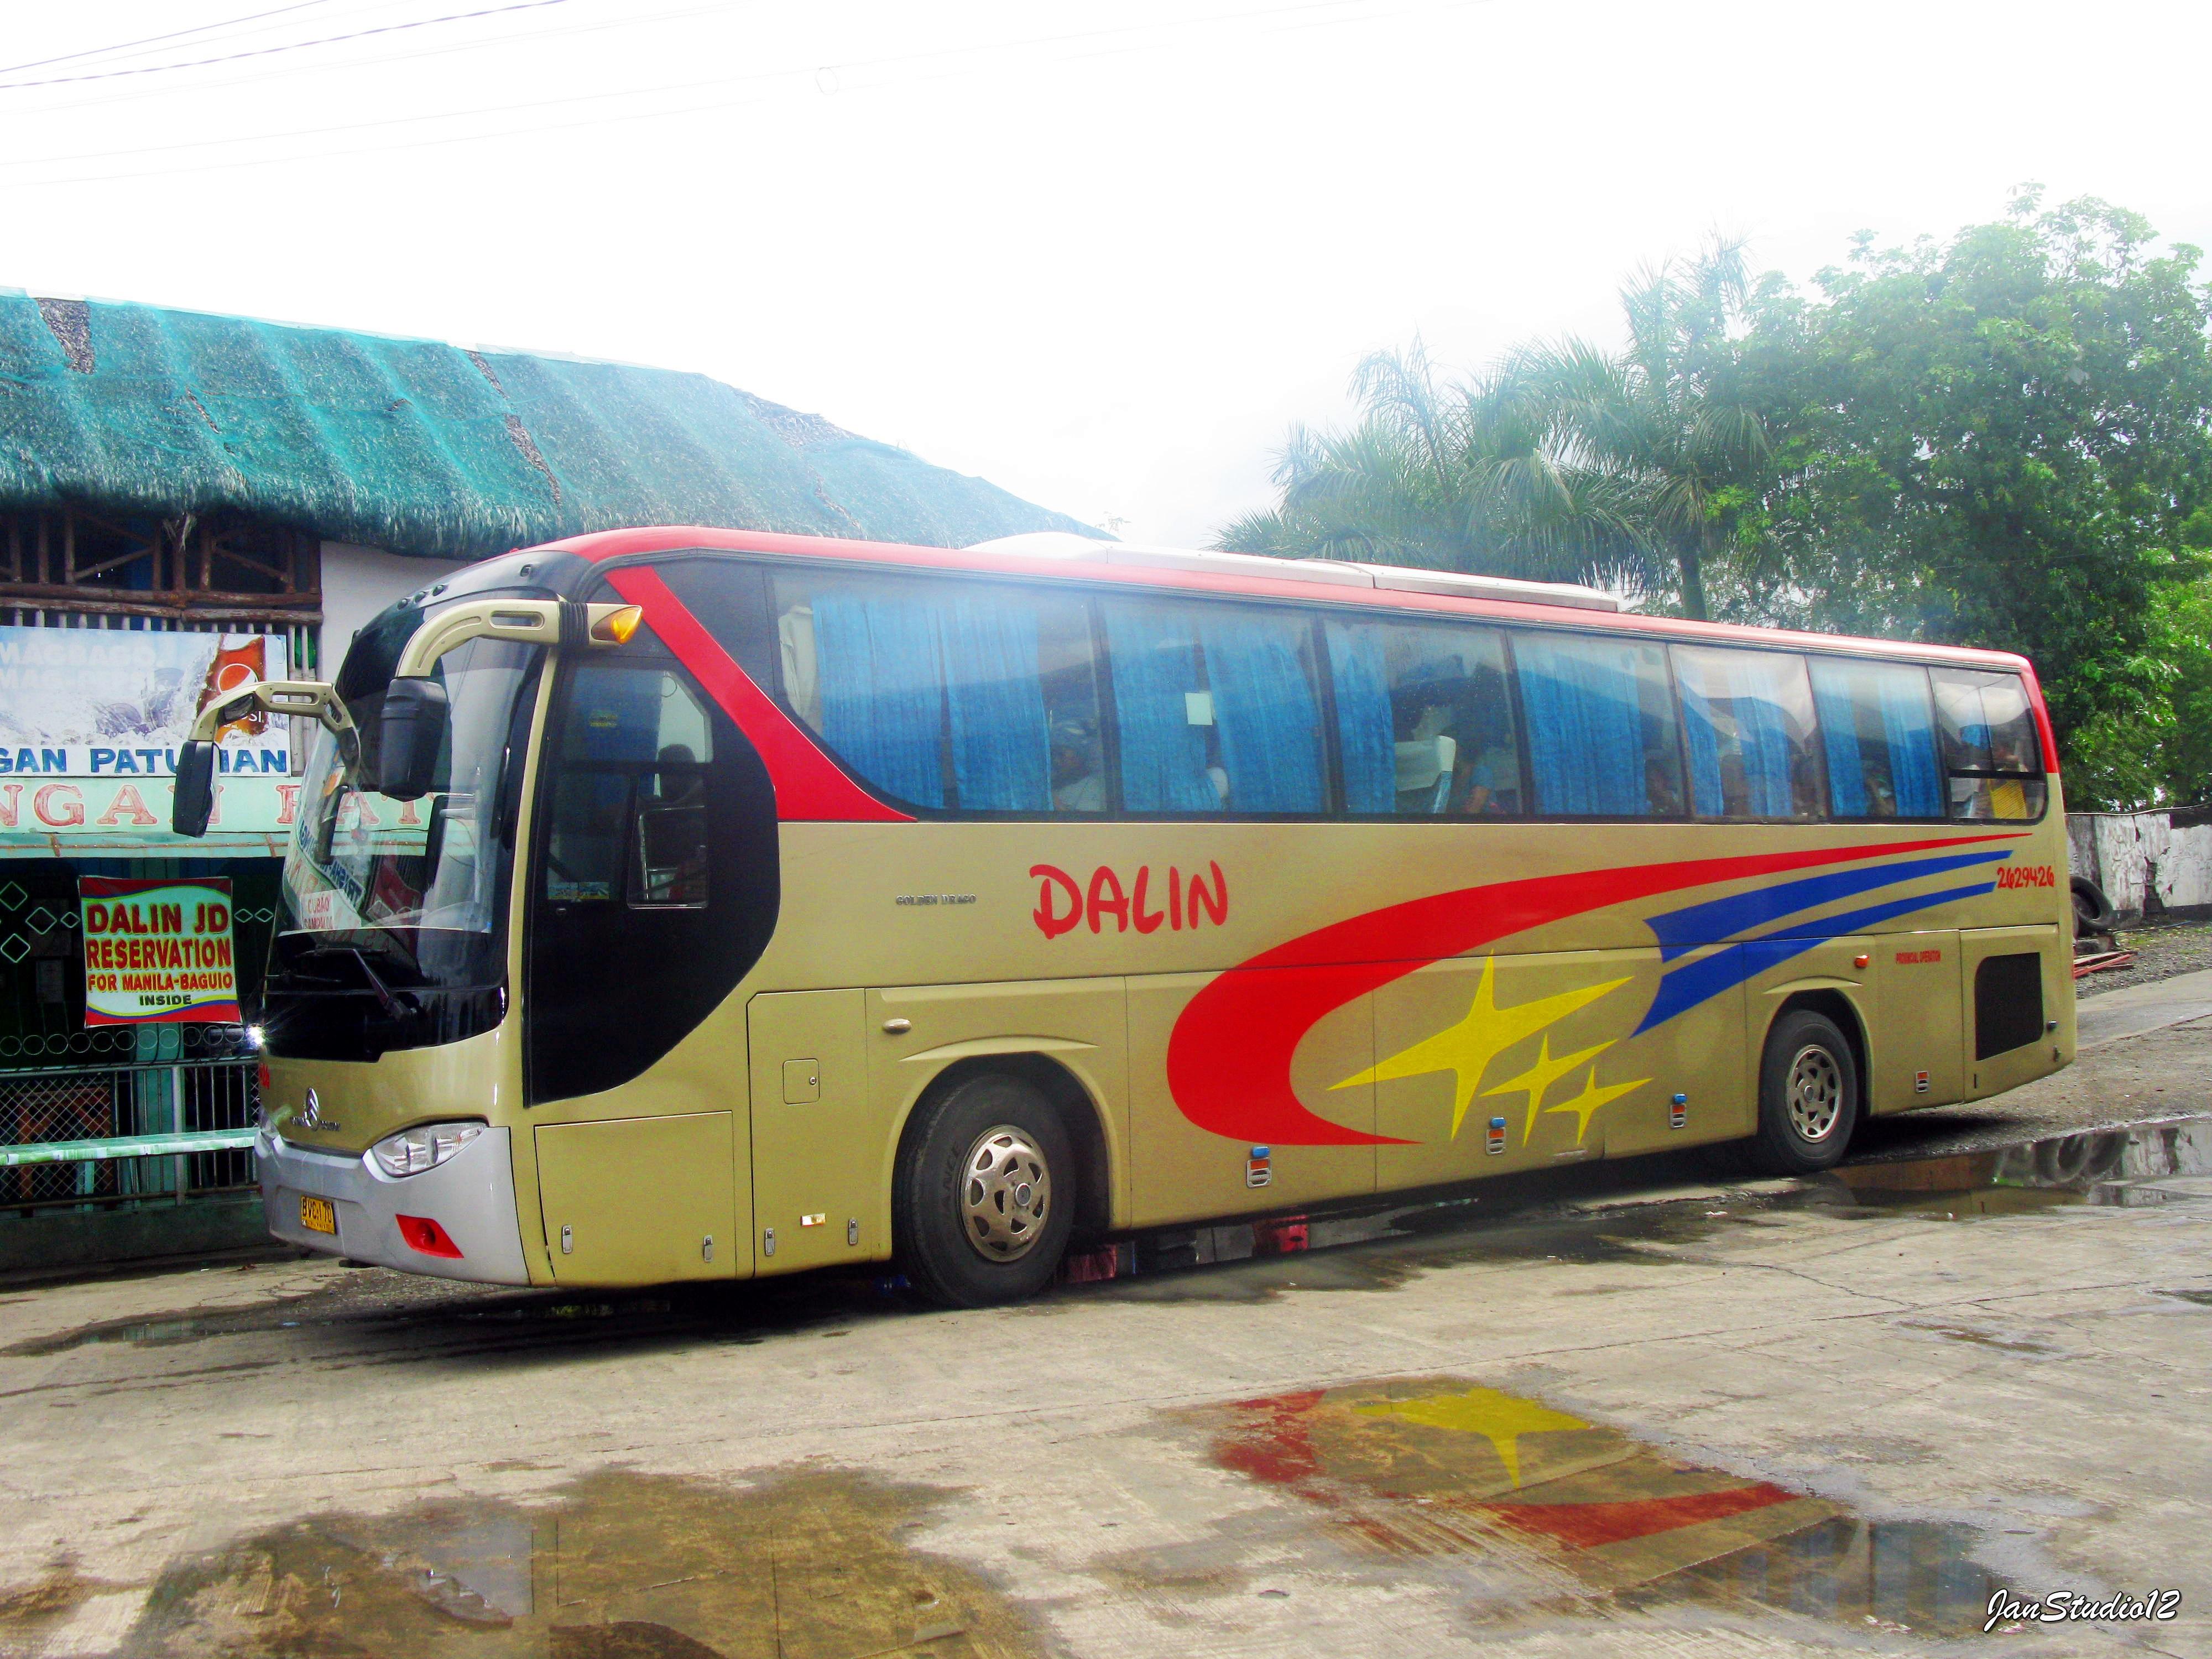 Fondos de pantalla : autobús, dorado, dragón, Ene, Pinoy, Dalin ...